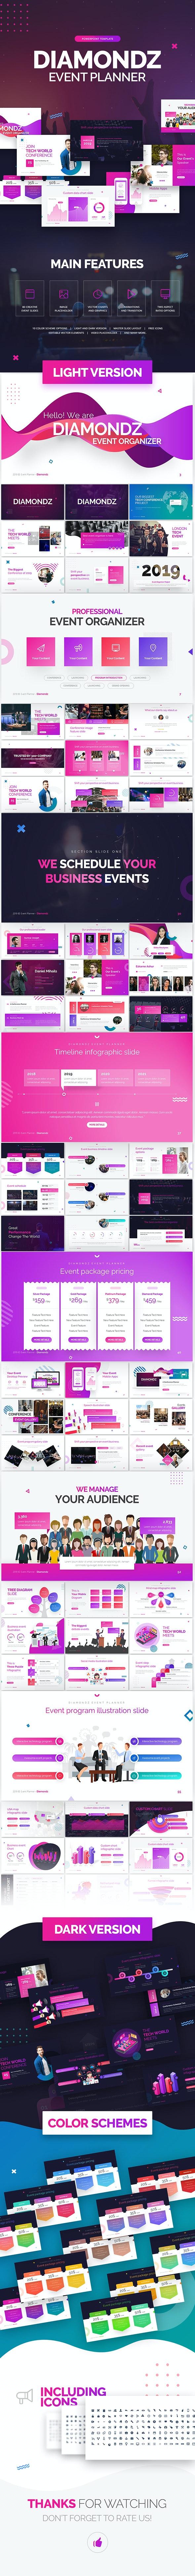 Diamondz Event Planner PowerPoint Template - PowerPoint Templates Presentation Templates